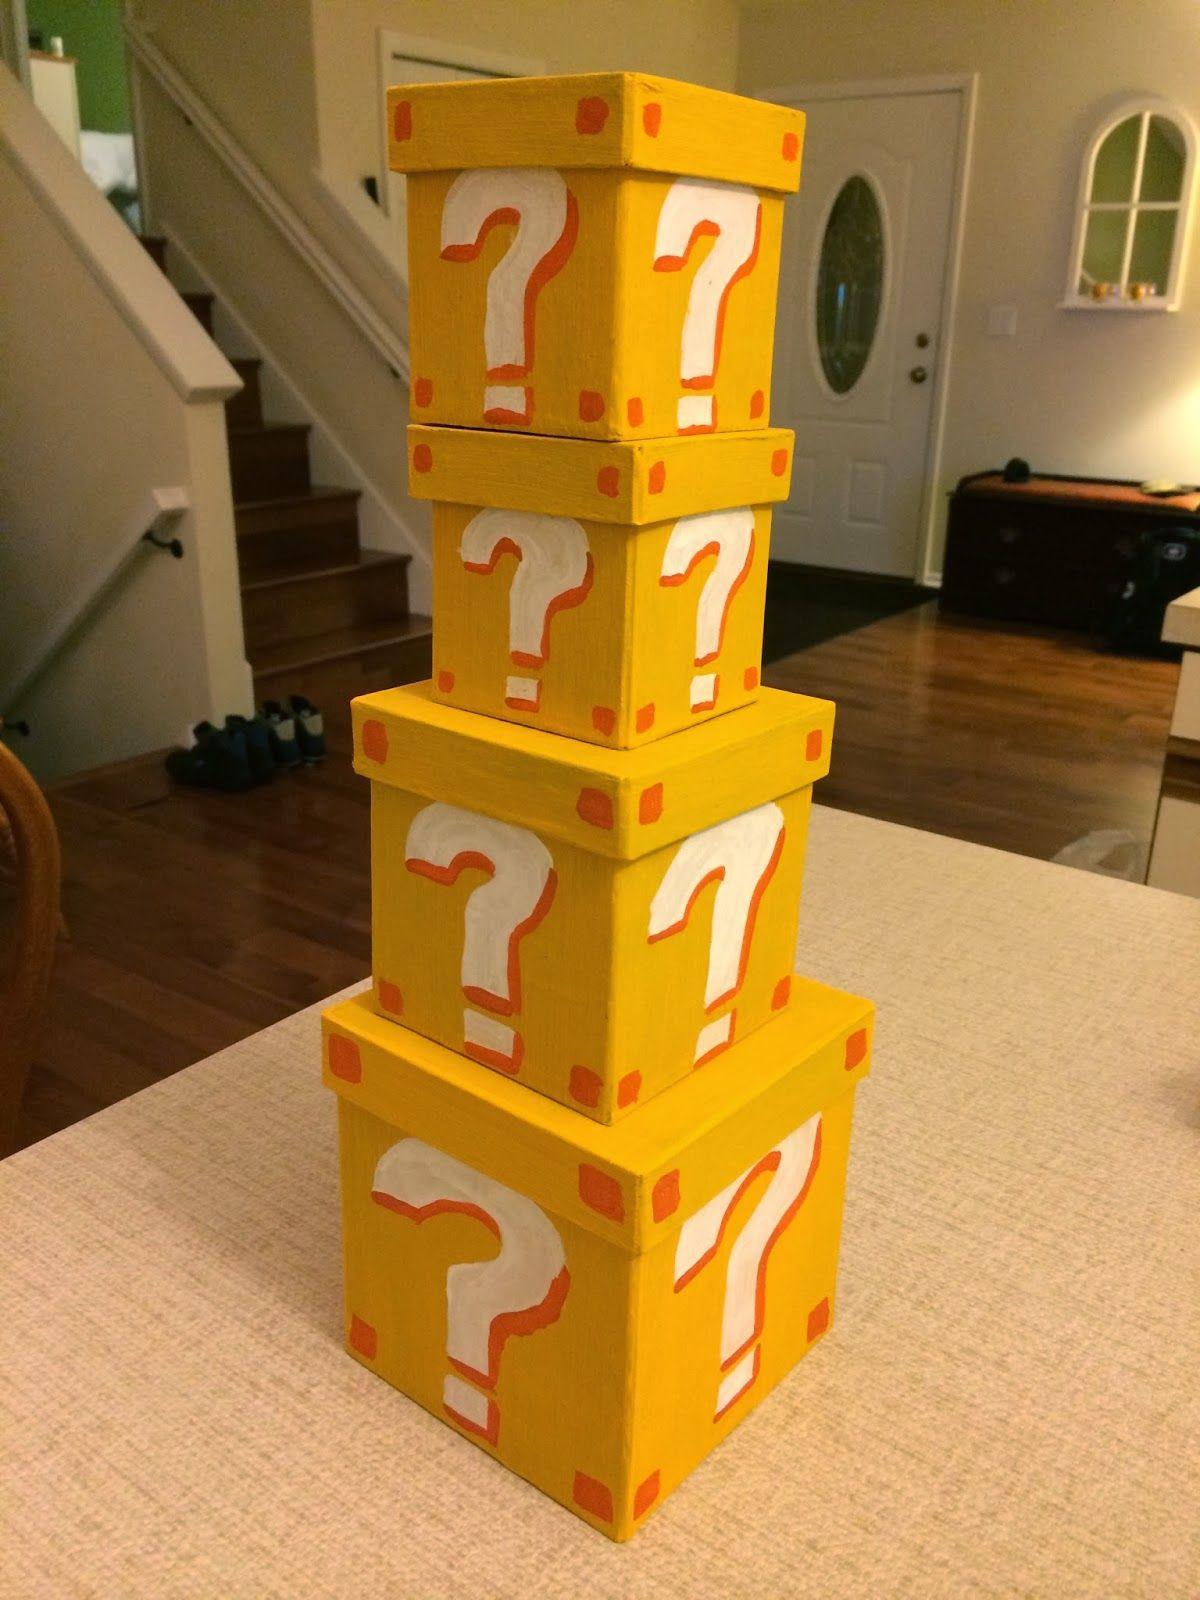 Mario Question Mark Boxes For Super Mario Bros Themed Baby